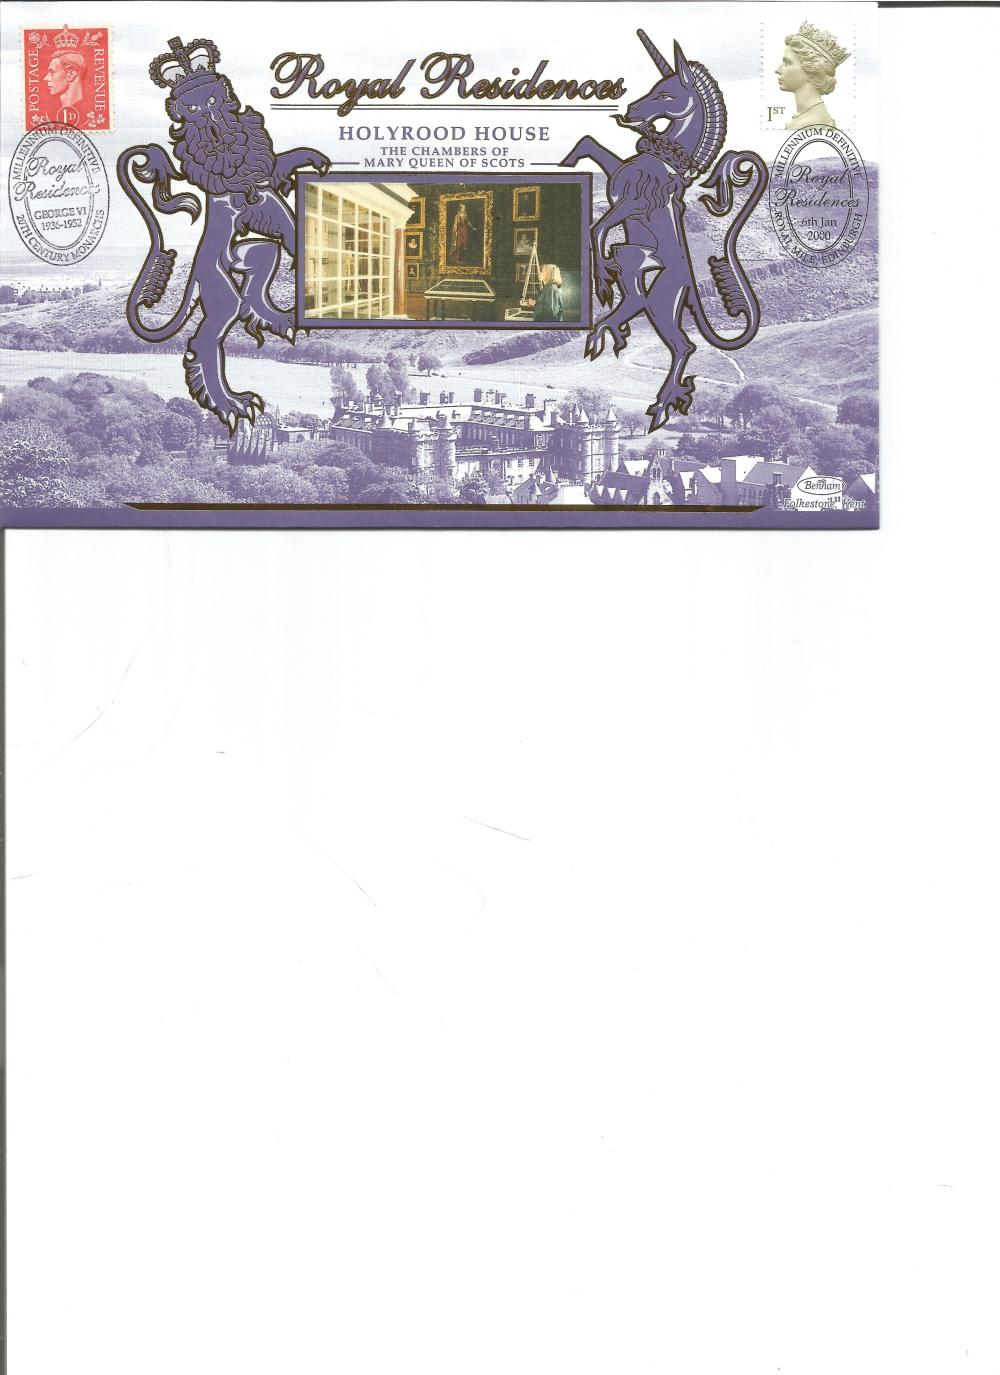 FDC Benham Millennium Definitive Royal Residences Holyrood House BS SP26 PM 6th Jan 2000. We combine